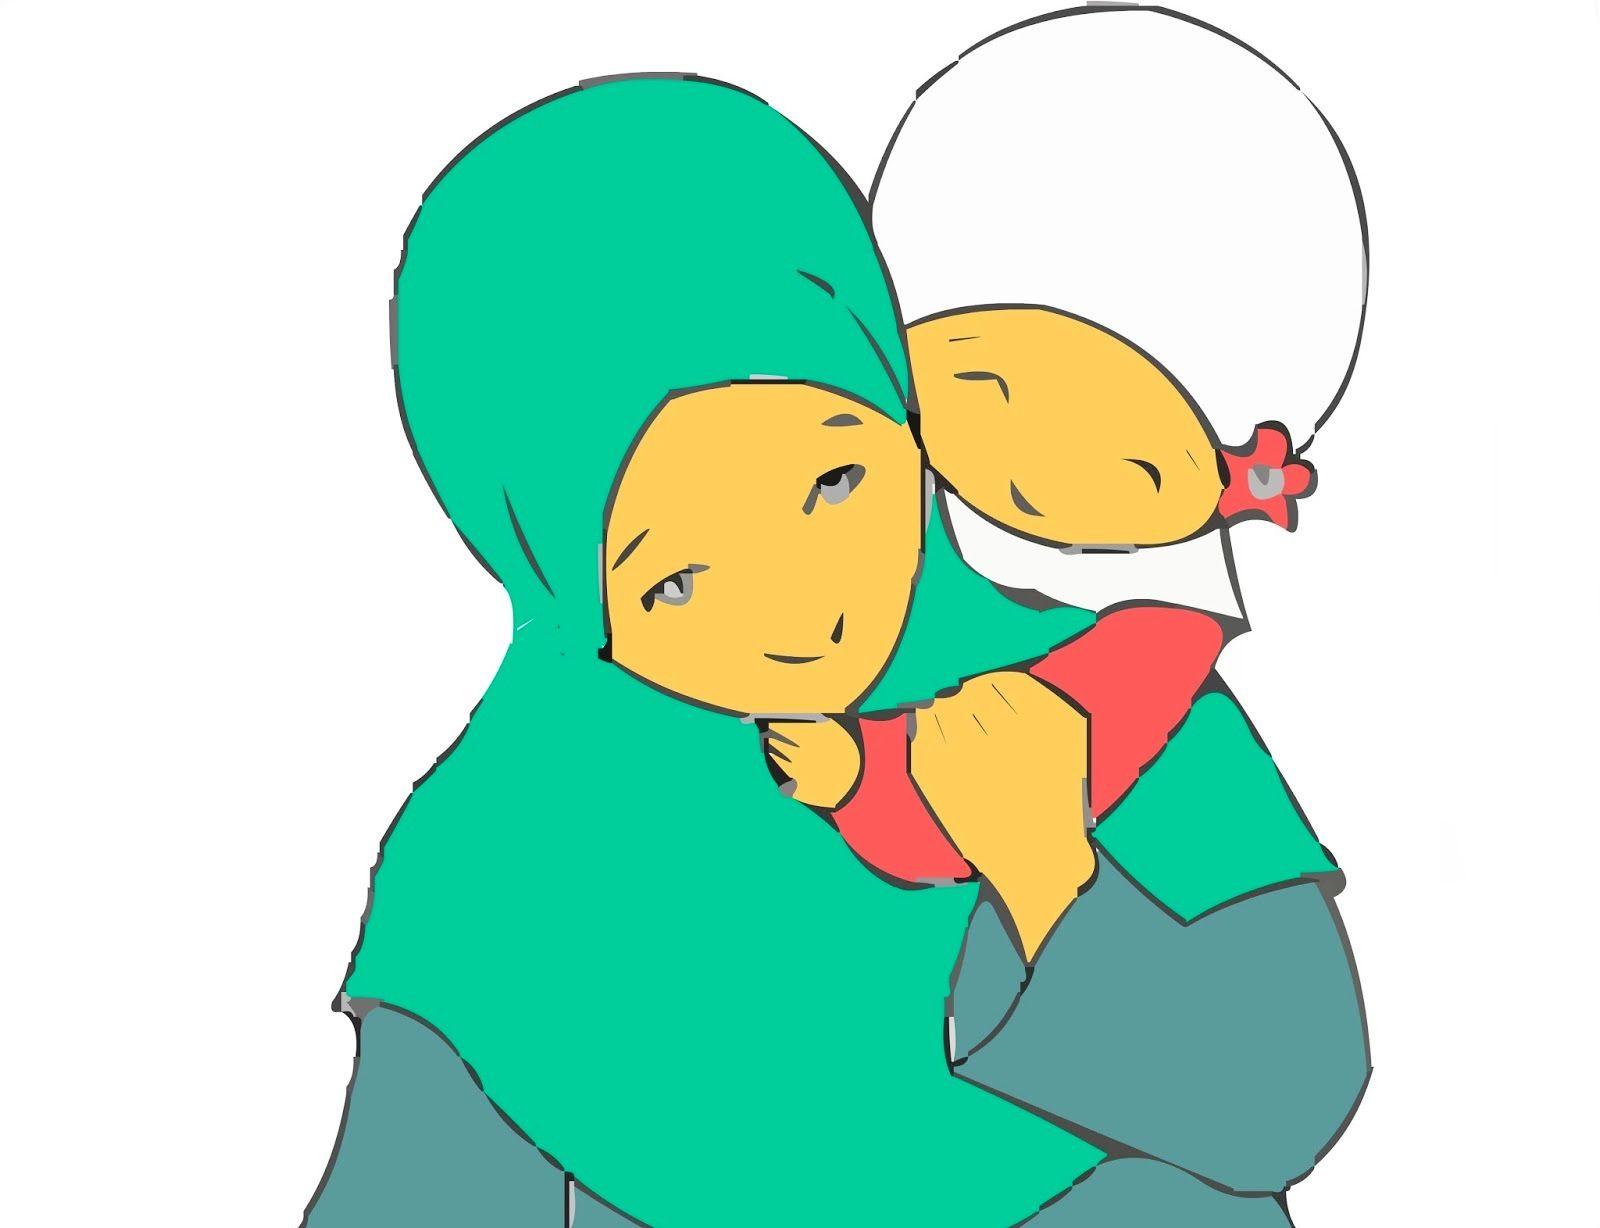 Gambar Kartun Ibu Dan Anak Gambar Pedia | Gambar animasi ...